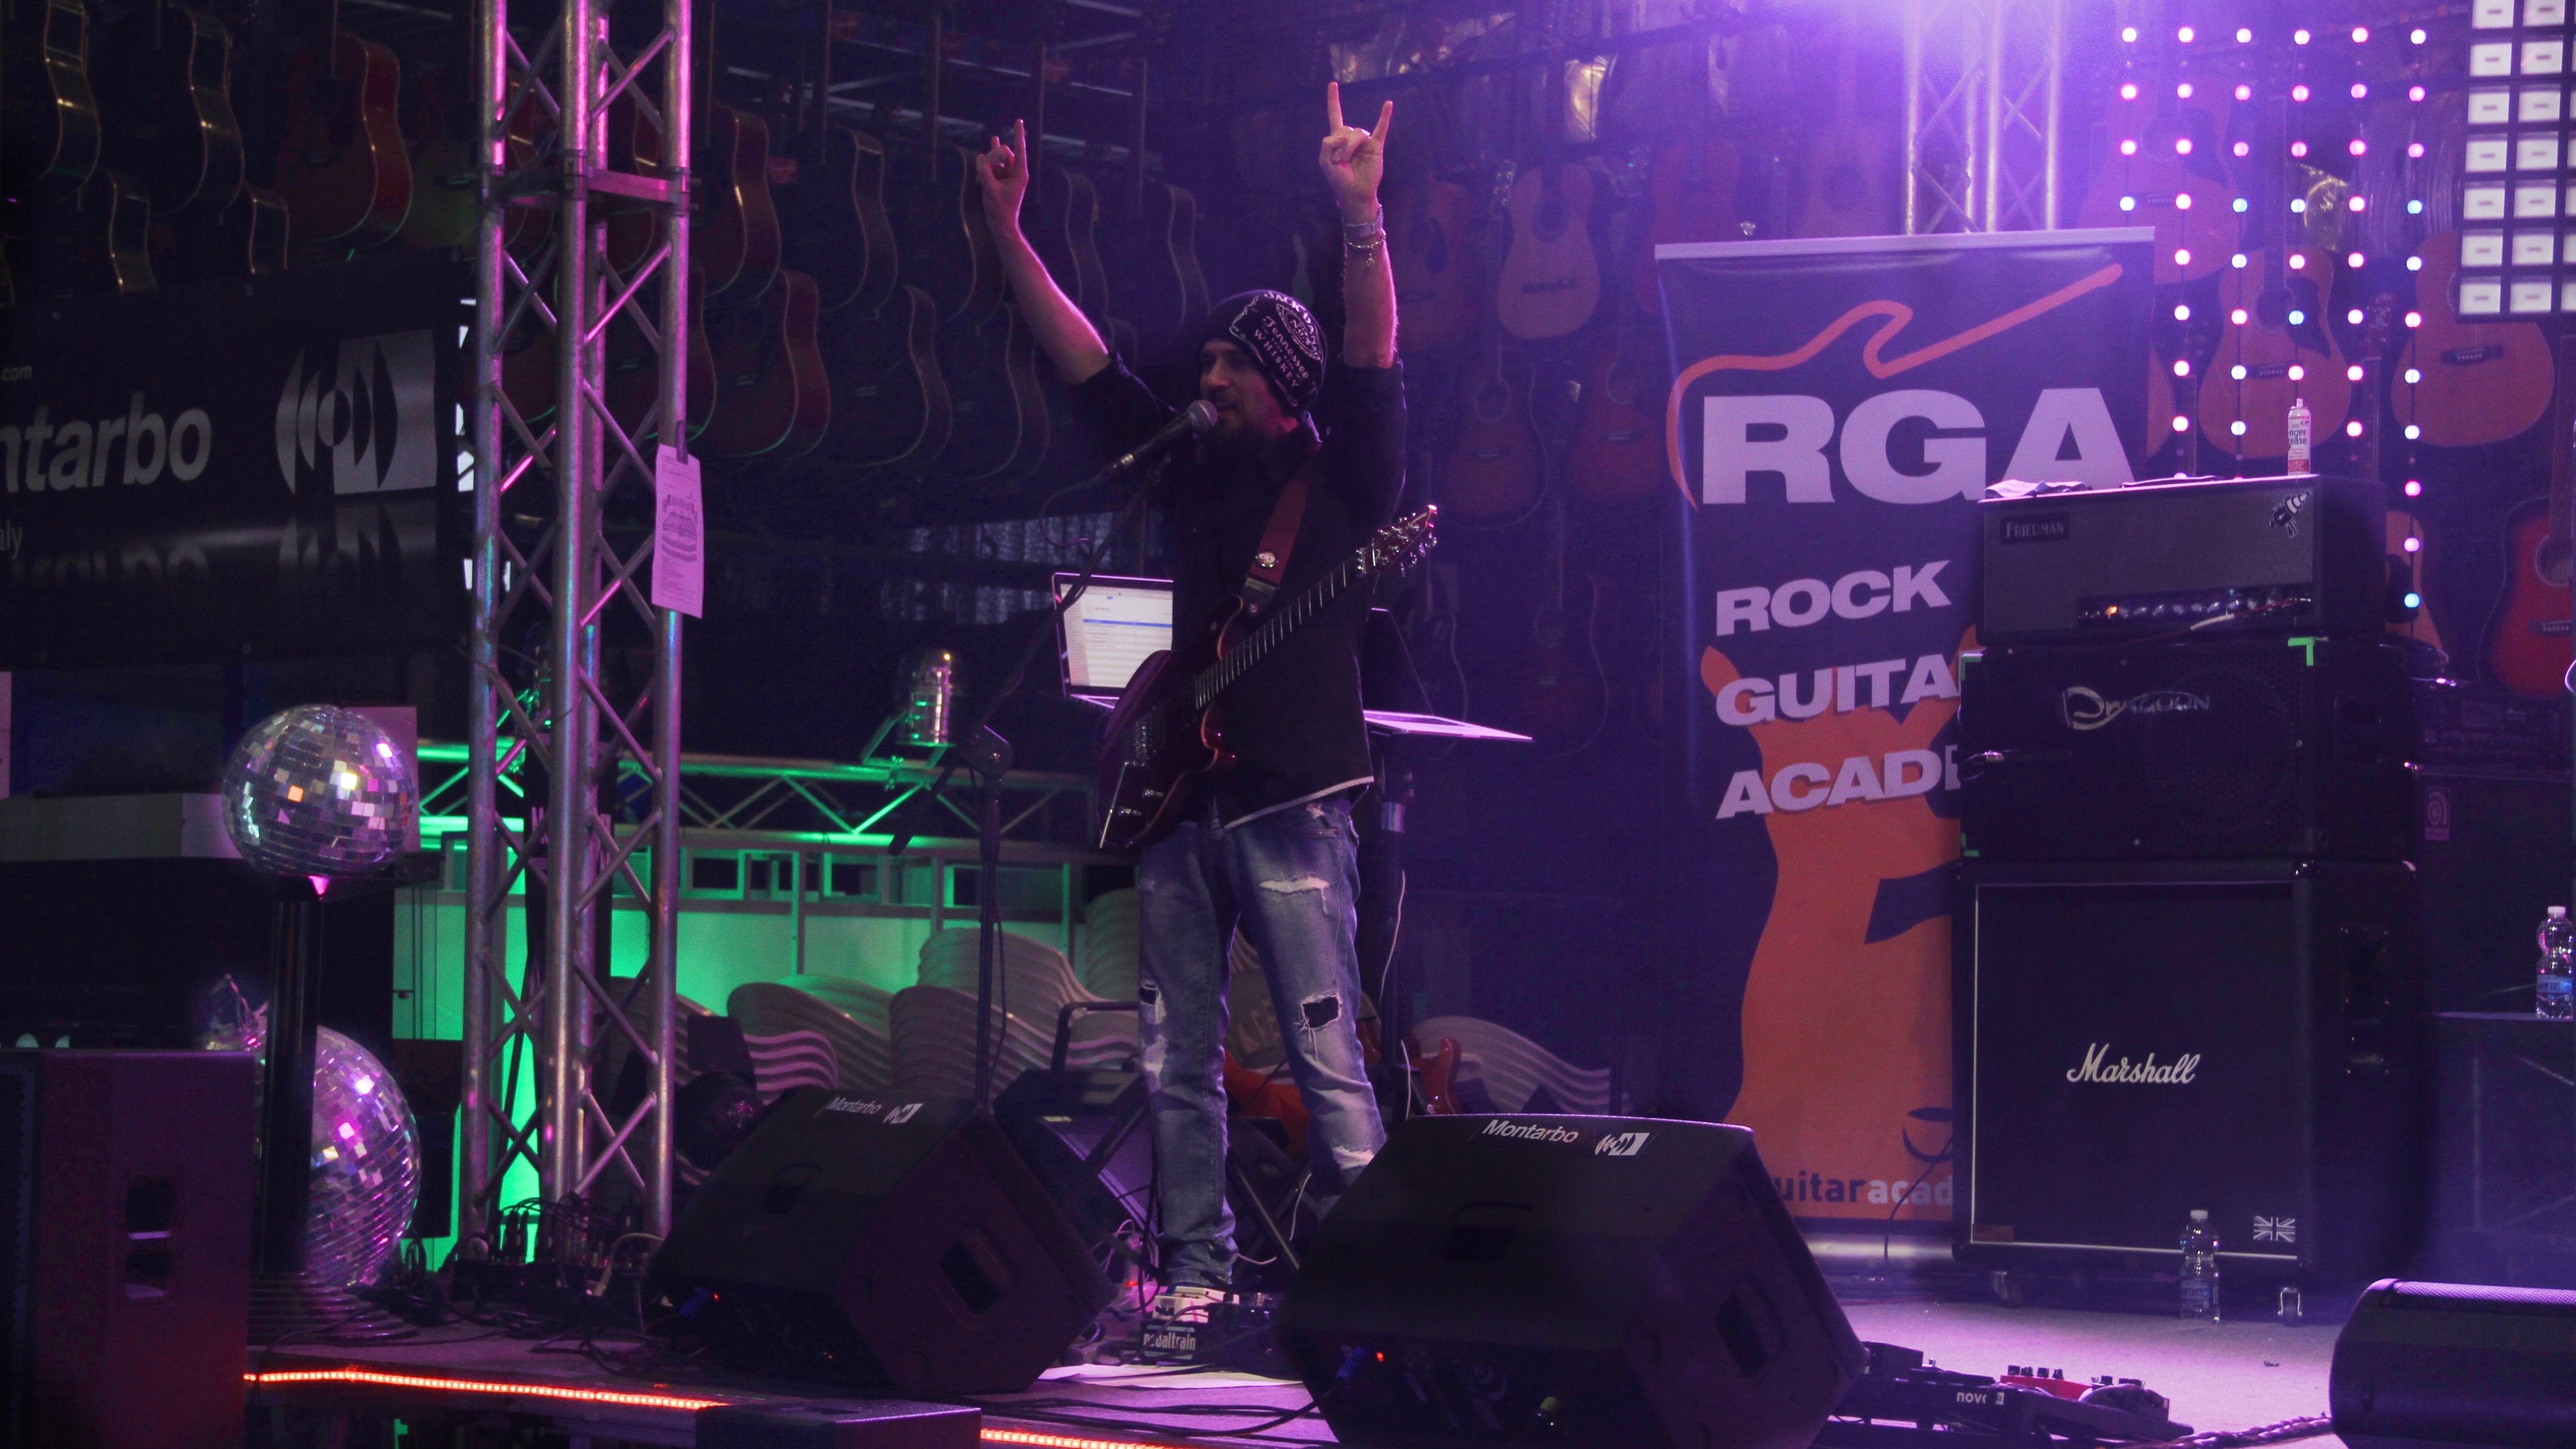 RGA Tour 2017 - Roberto Fazari - Essemusic (Montebelluna - TV)